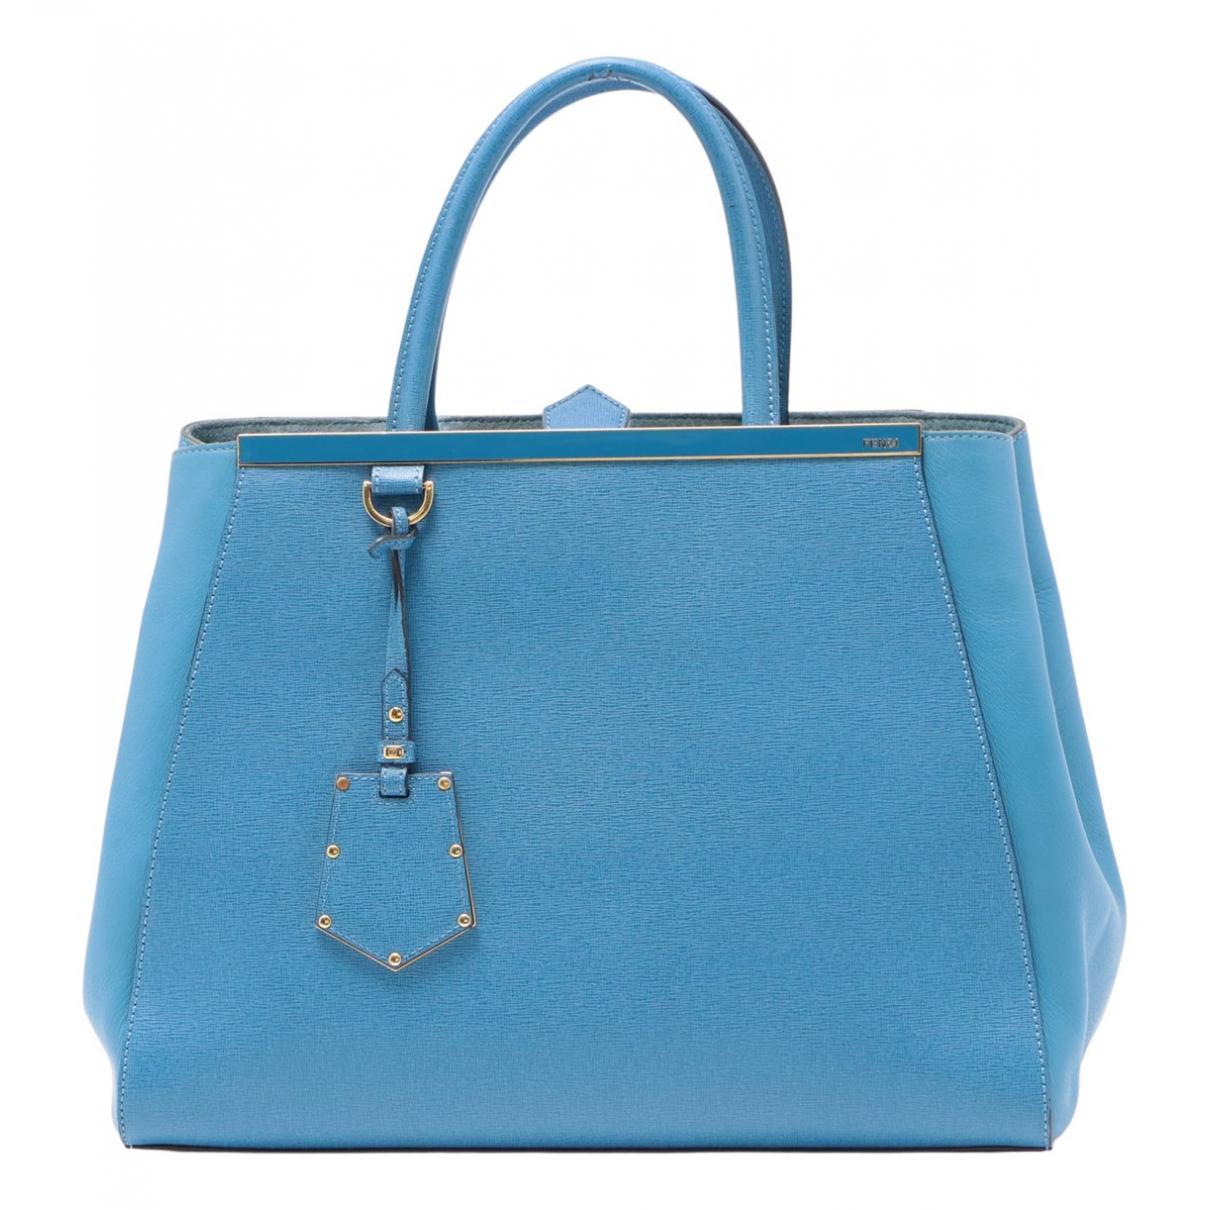 Fendi 2Jours Handtasche in  Blau Leder